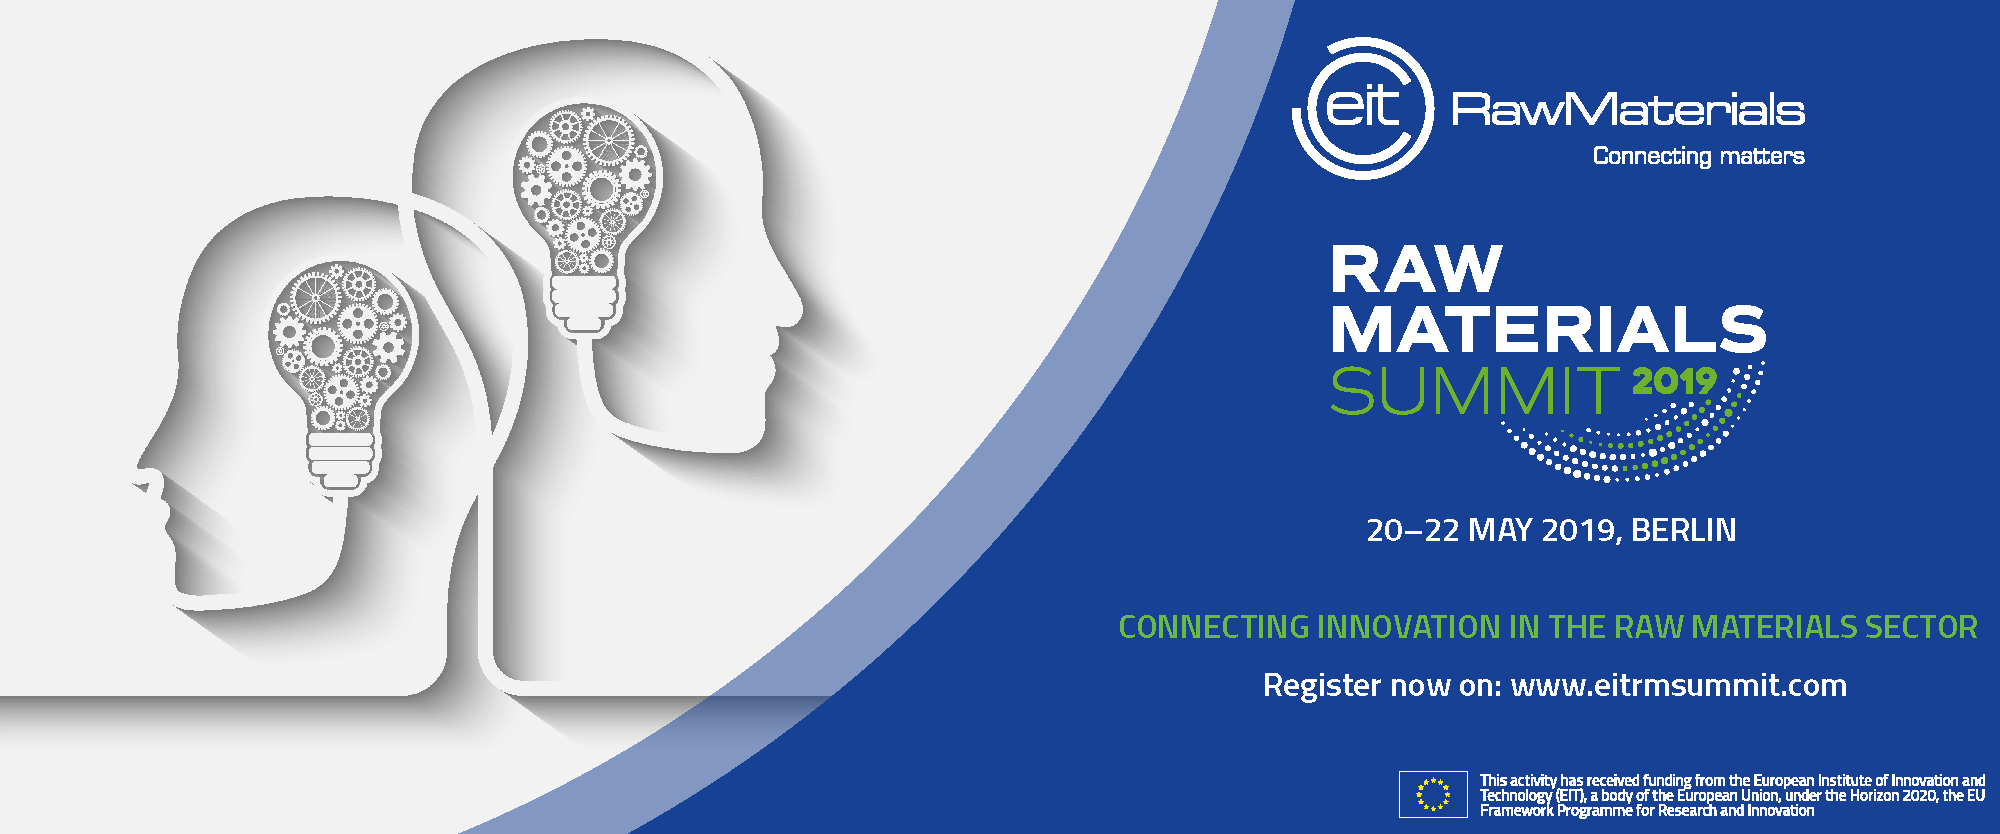 Raw Materials Summit 2019 – EIT RawMaterials